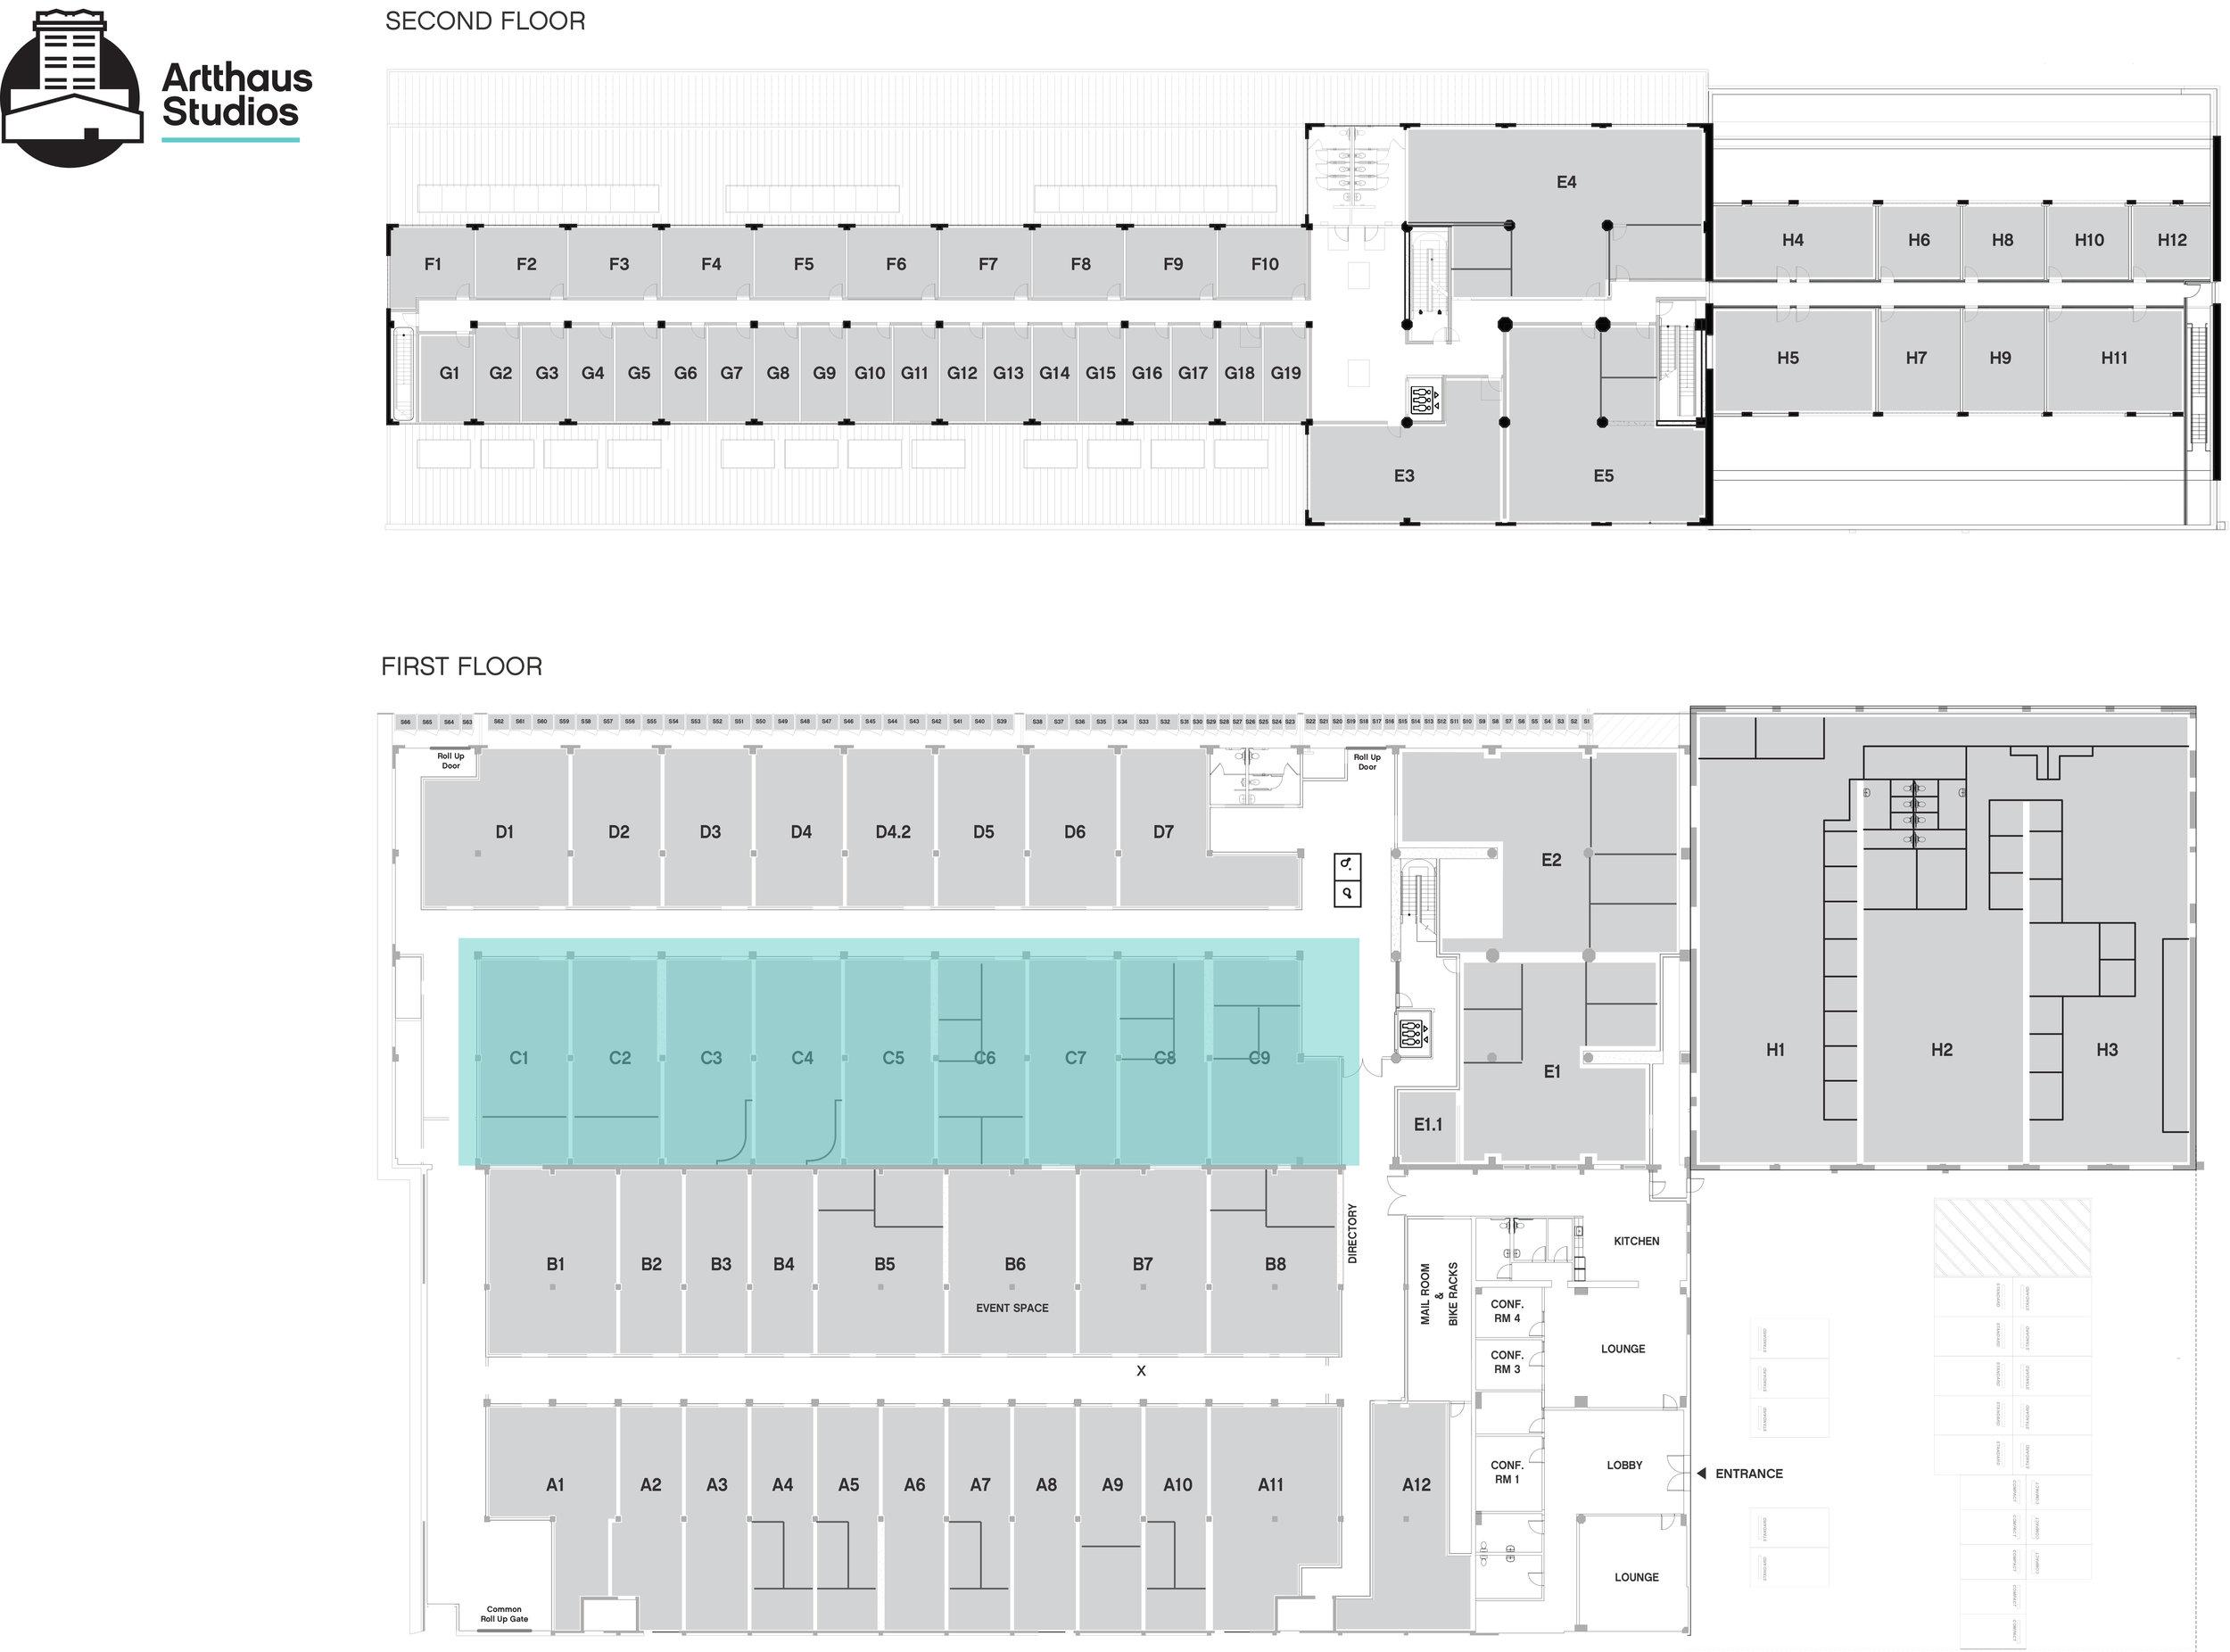 Artthaus Studios_Map_Cspaces.jpg